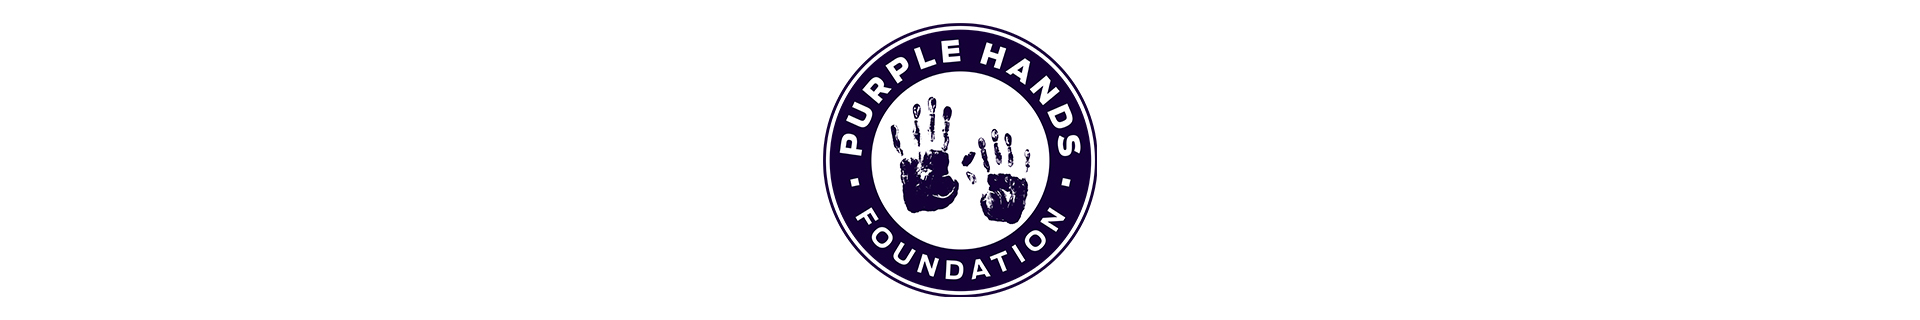 Purple Hands Foundation